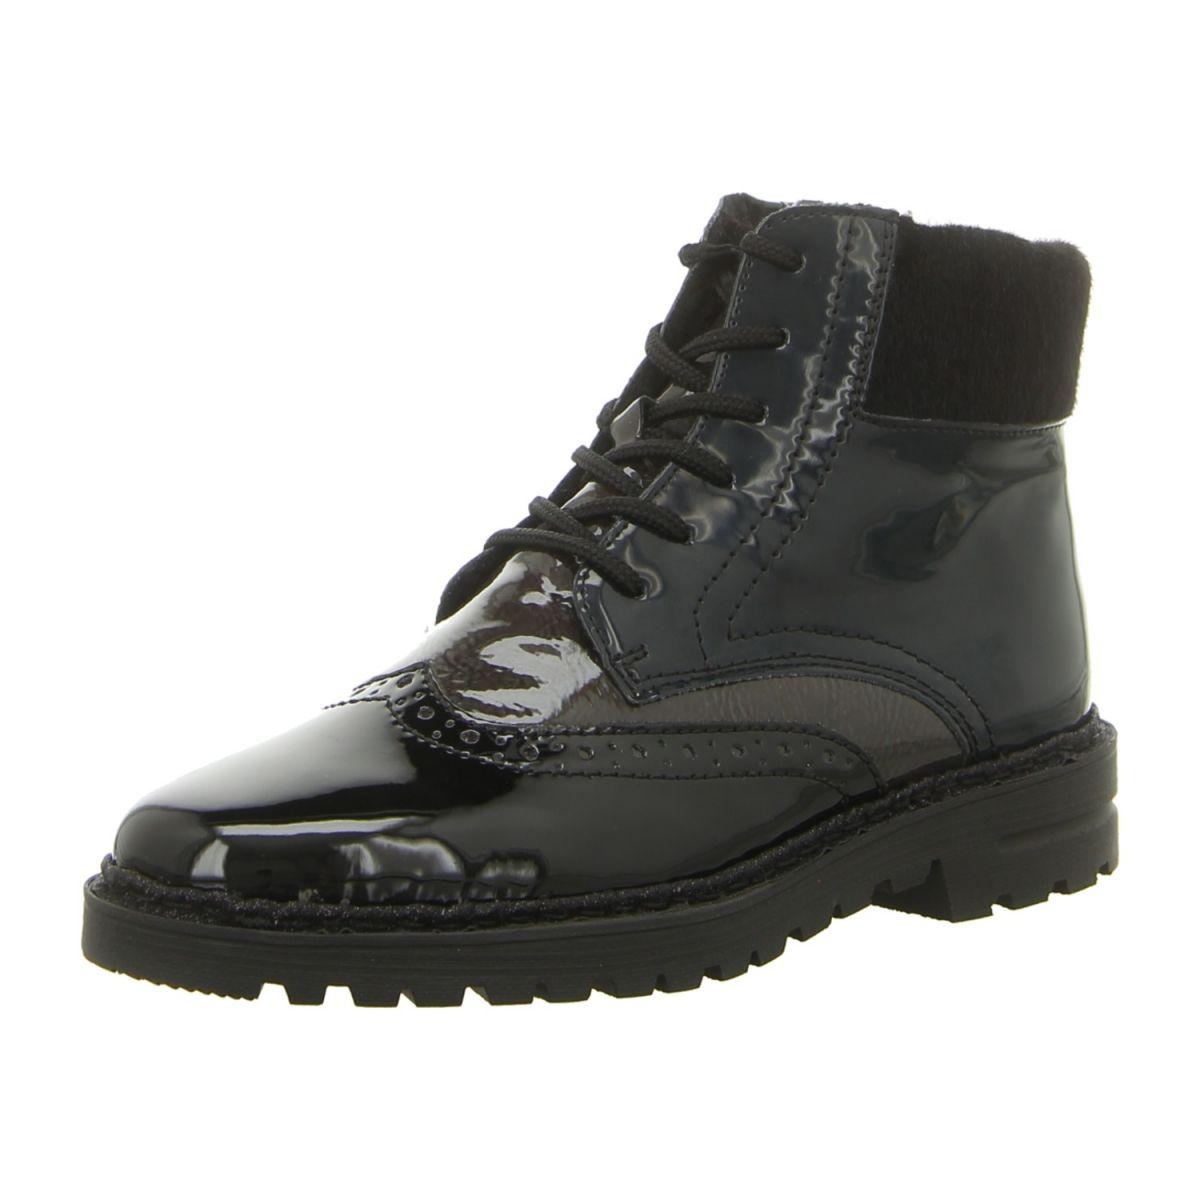 NEU  Rieker Stiefeletten 75323-01 - schwarz fumo marine  -   Schuhe ... e267f6a1b7